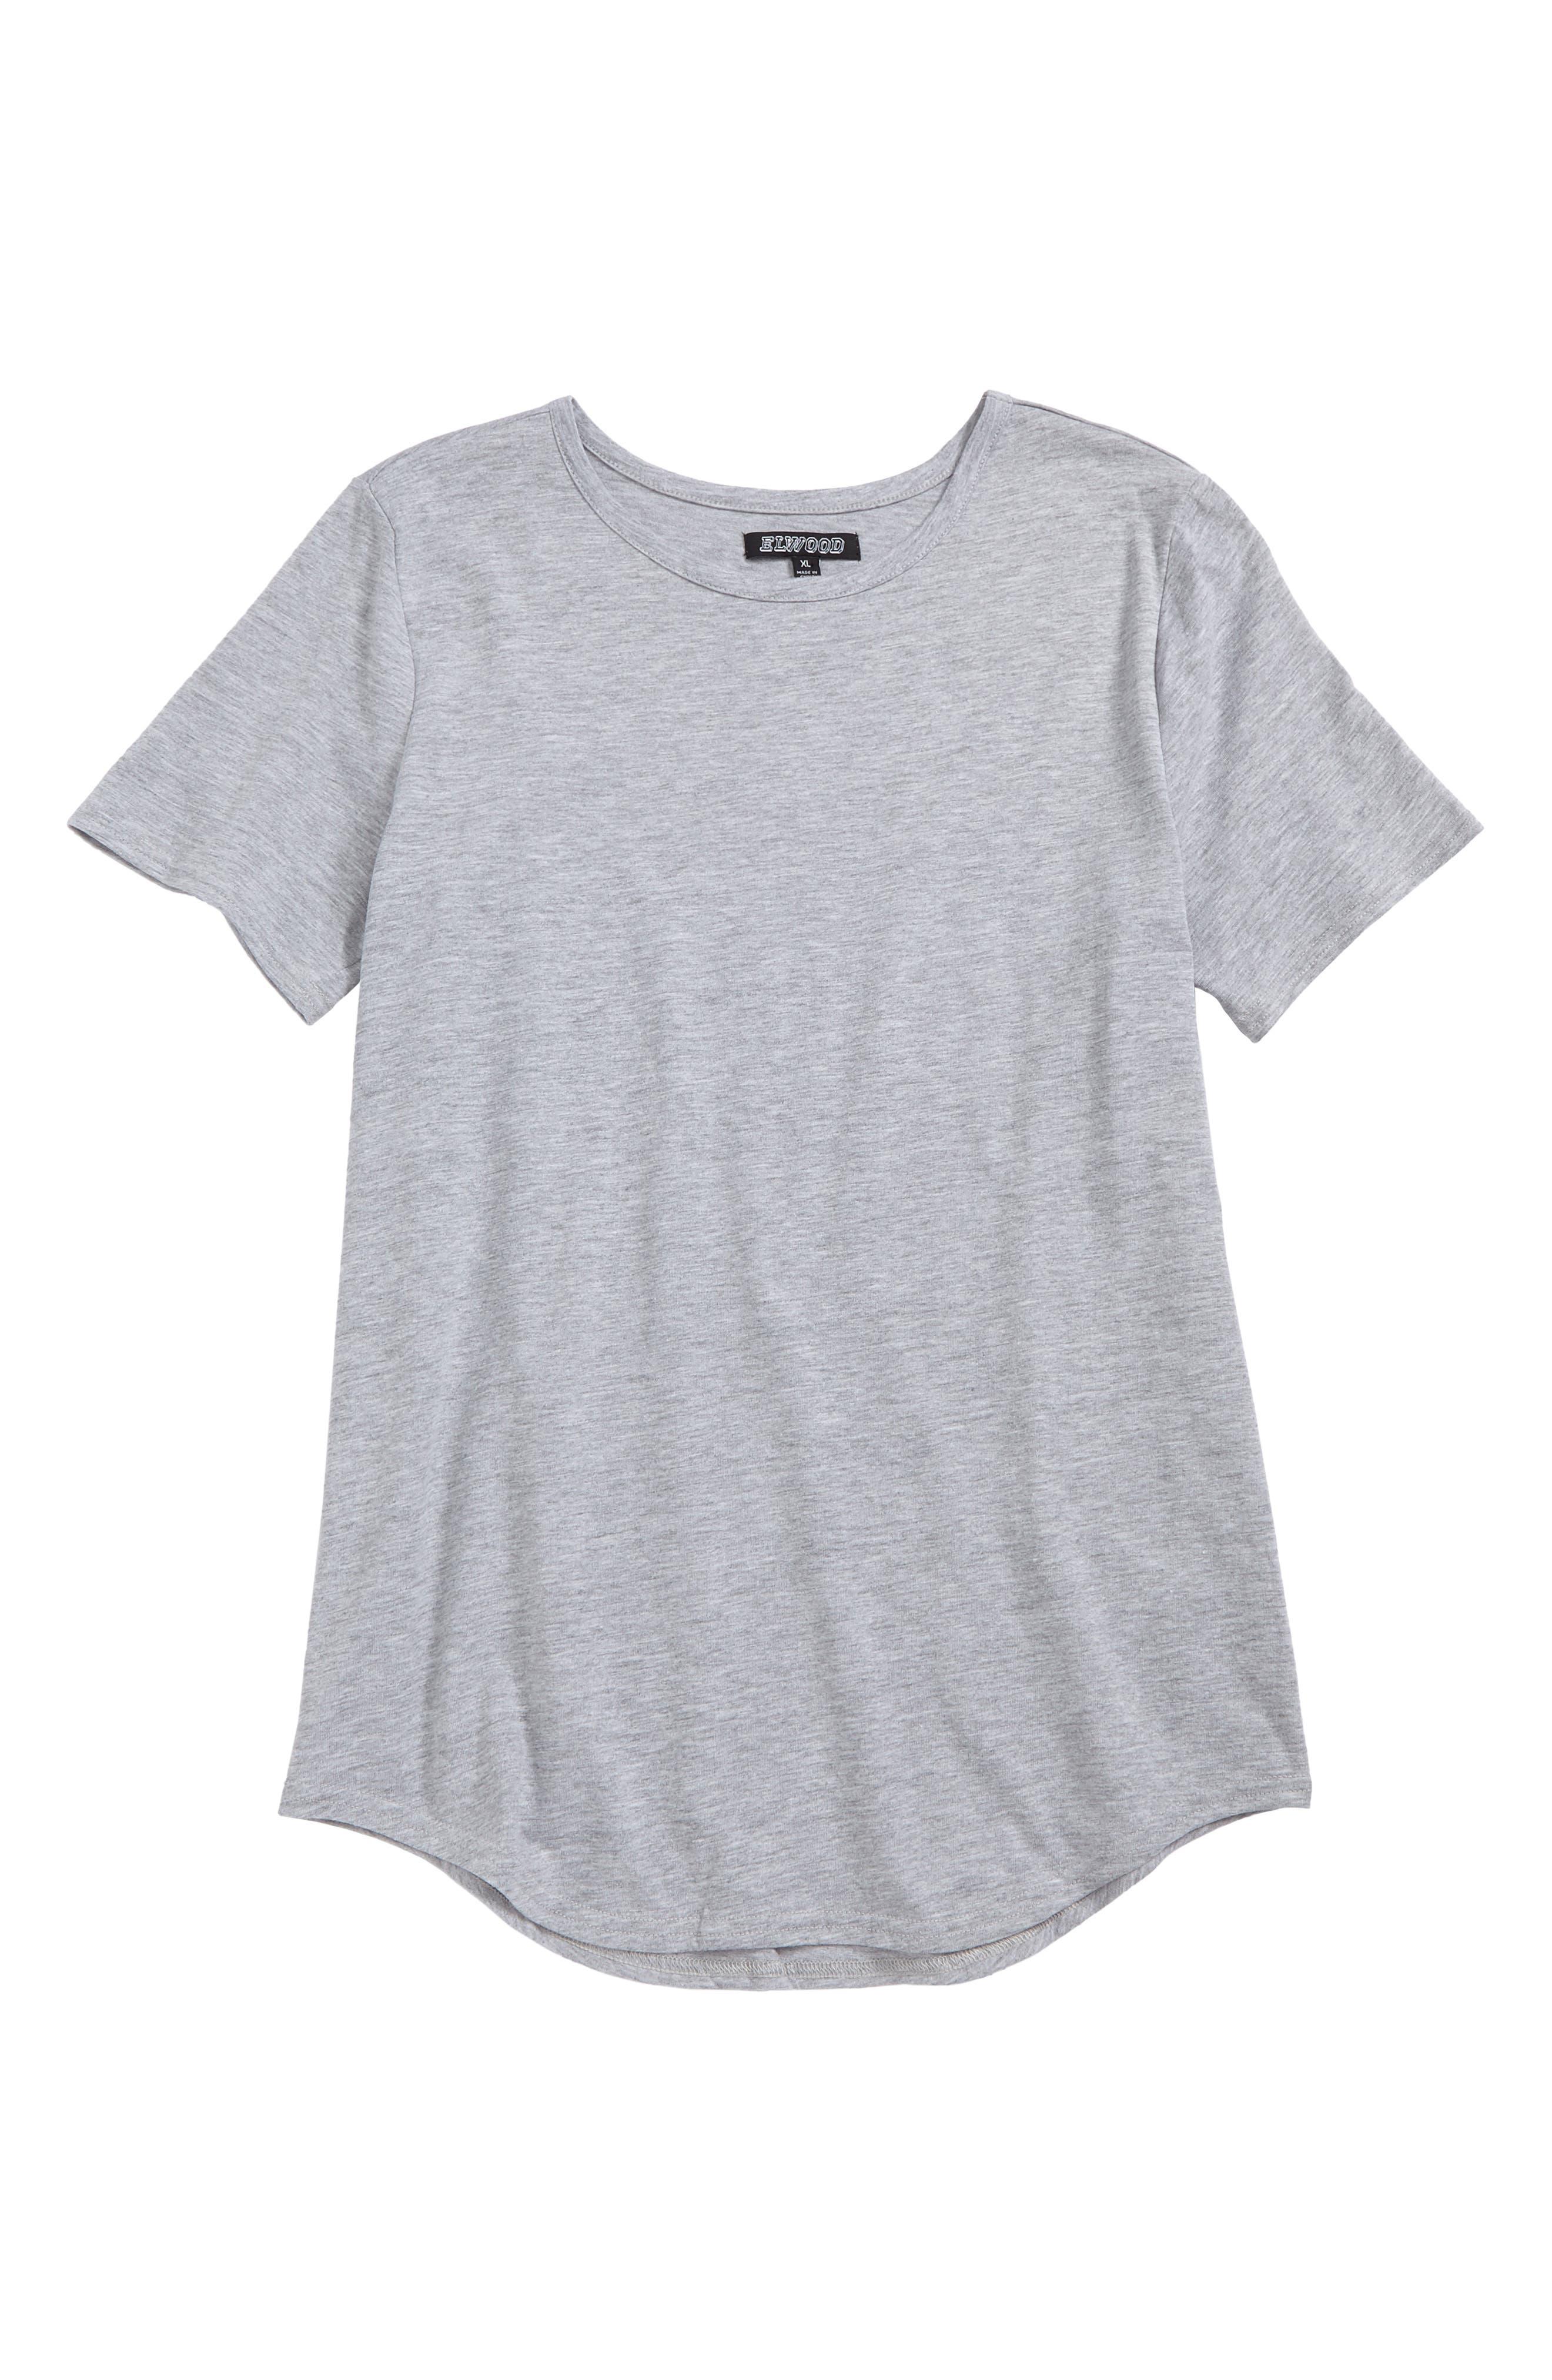 Main Image - Elwood Curved Hem T-Shirt (Big Boys)